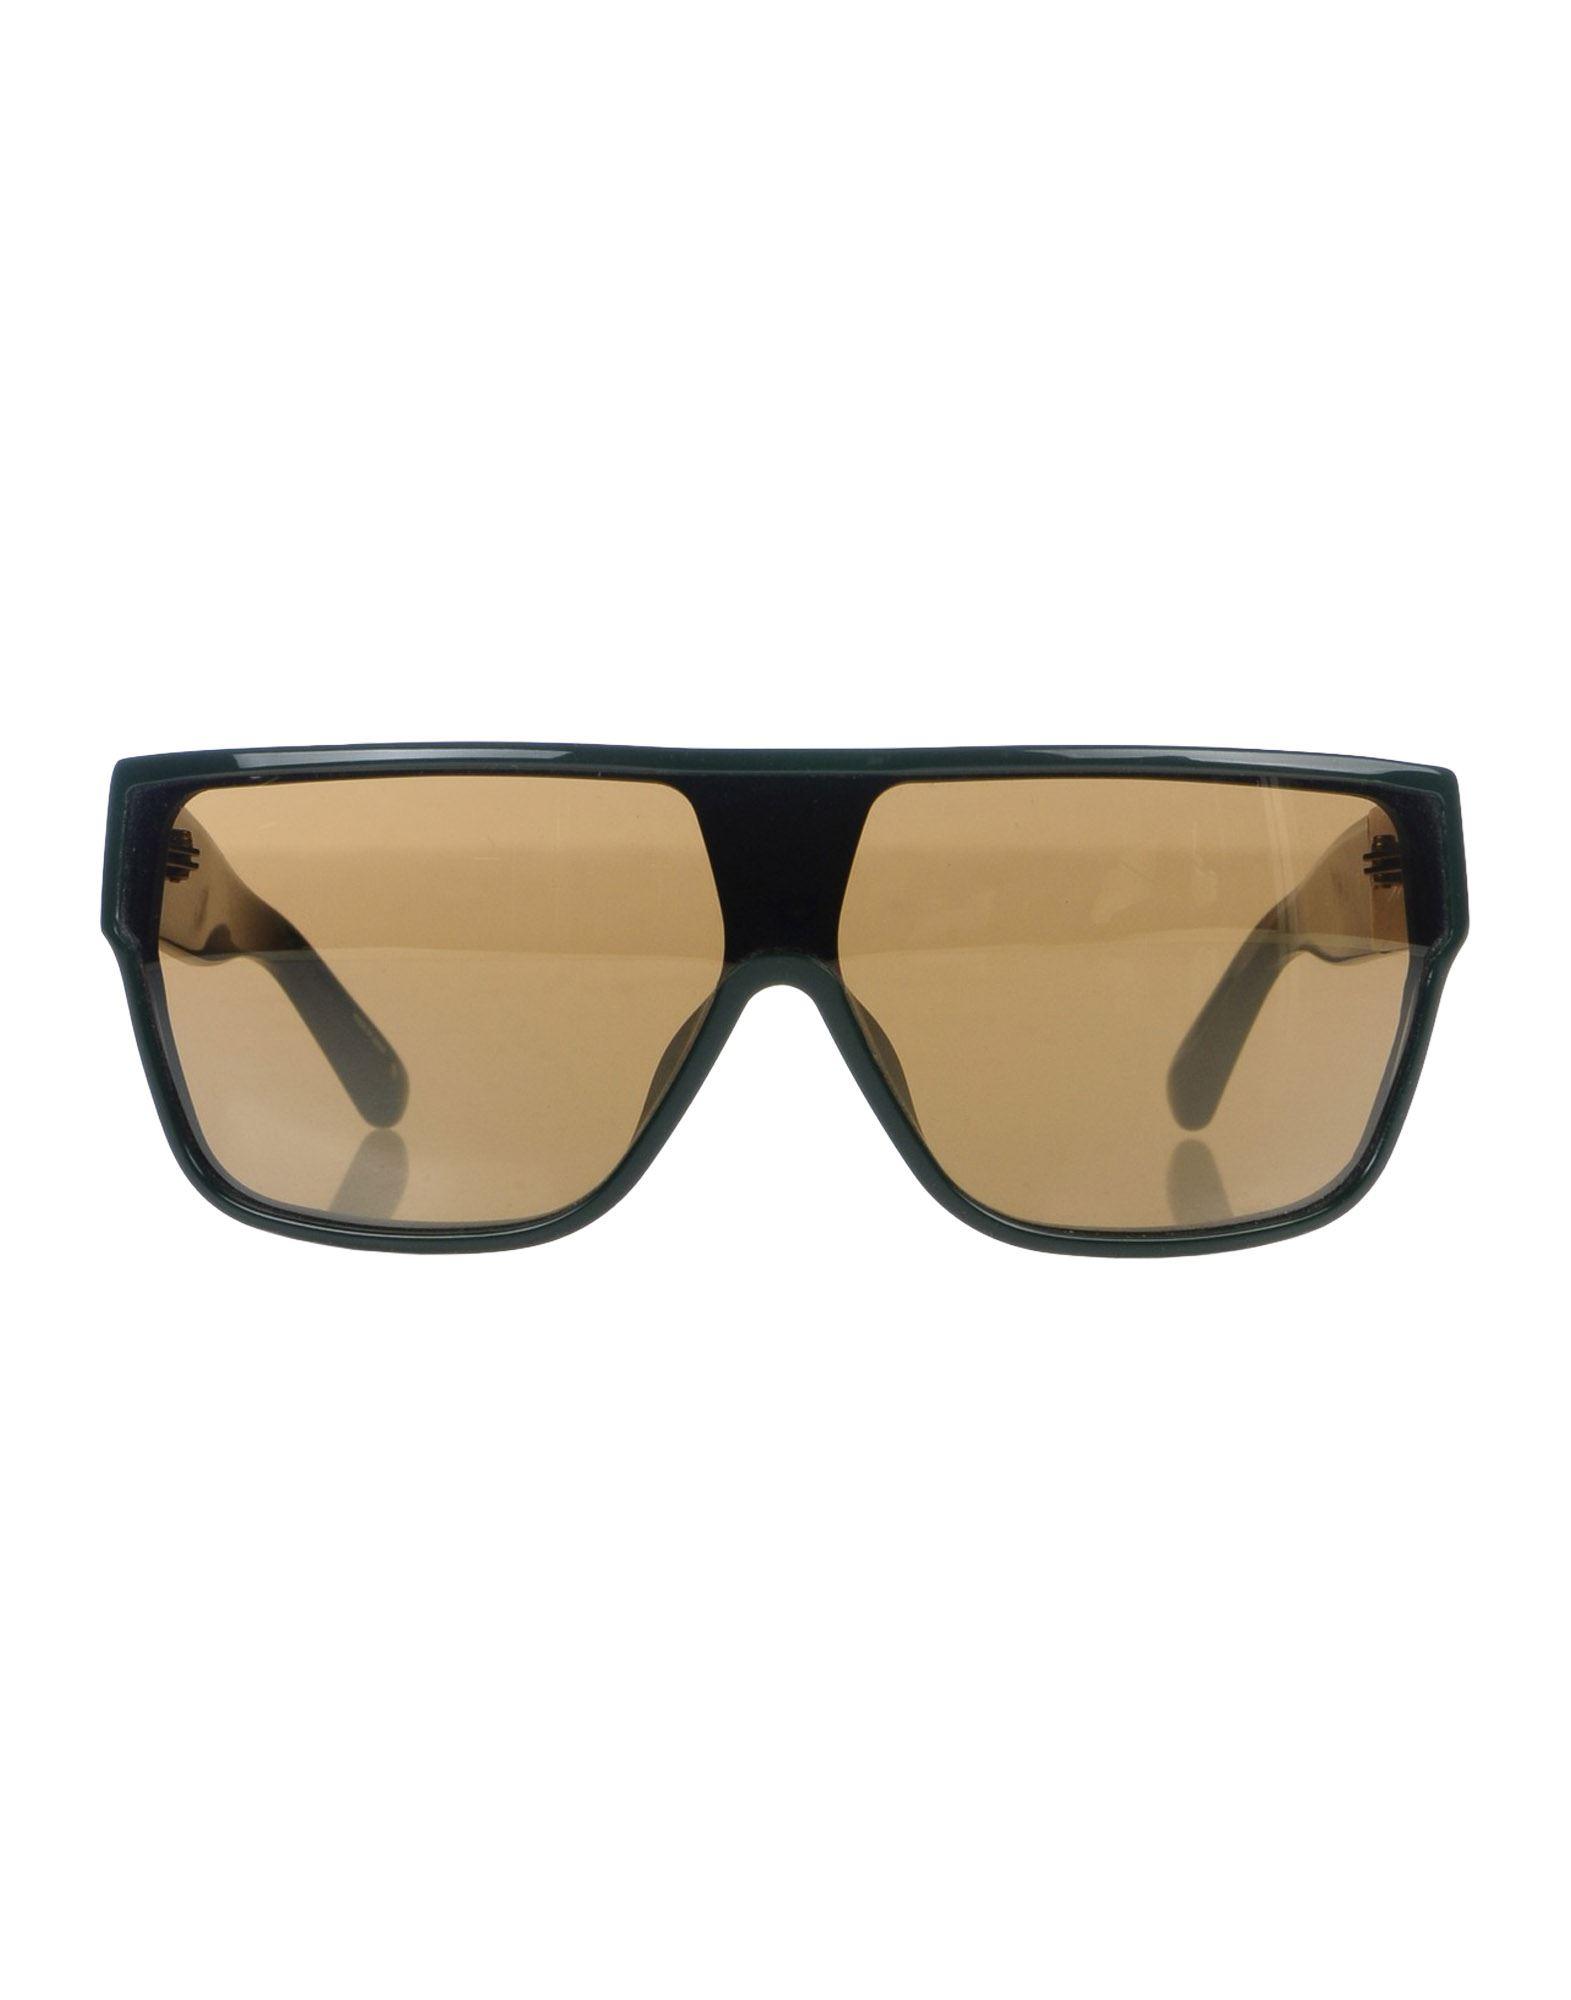 LINDA FARROW with 3.1 PHILLIP LIM Солнечные очки linda farrow черепаховые солнцезащитные очки linda farrow x phillip lim